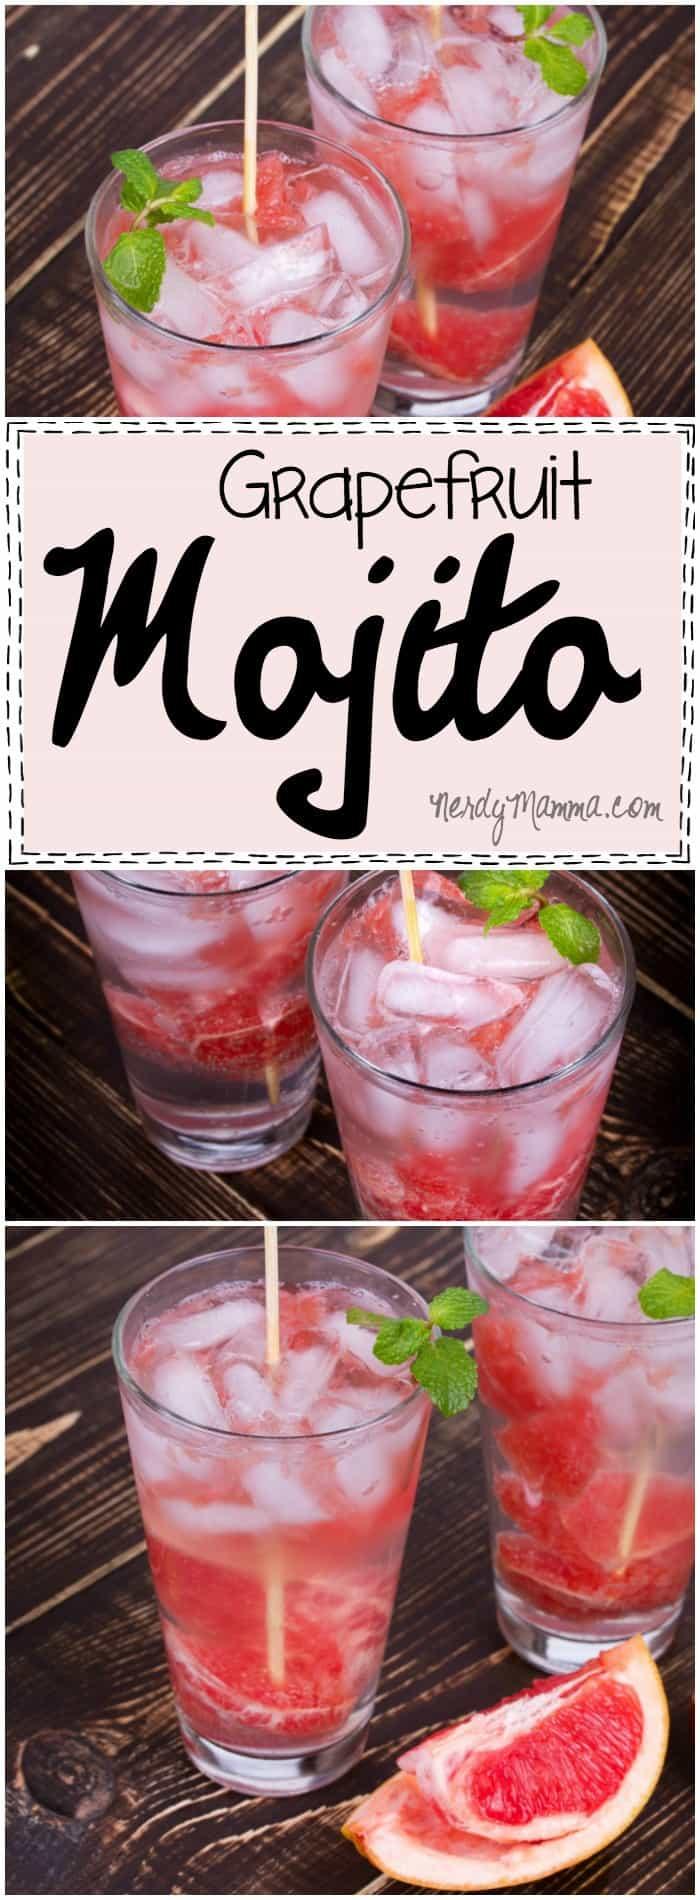 I love this recipe for grapefruit mojitos! I had no idea they were so easy!